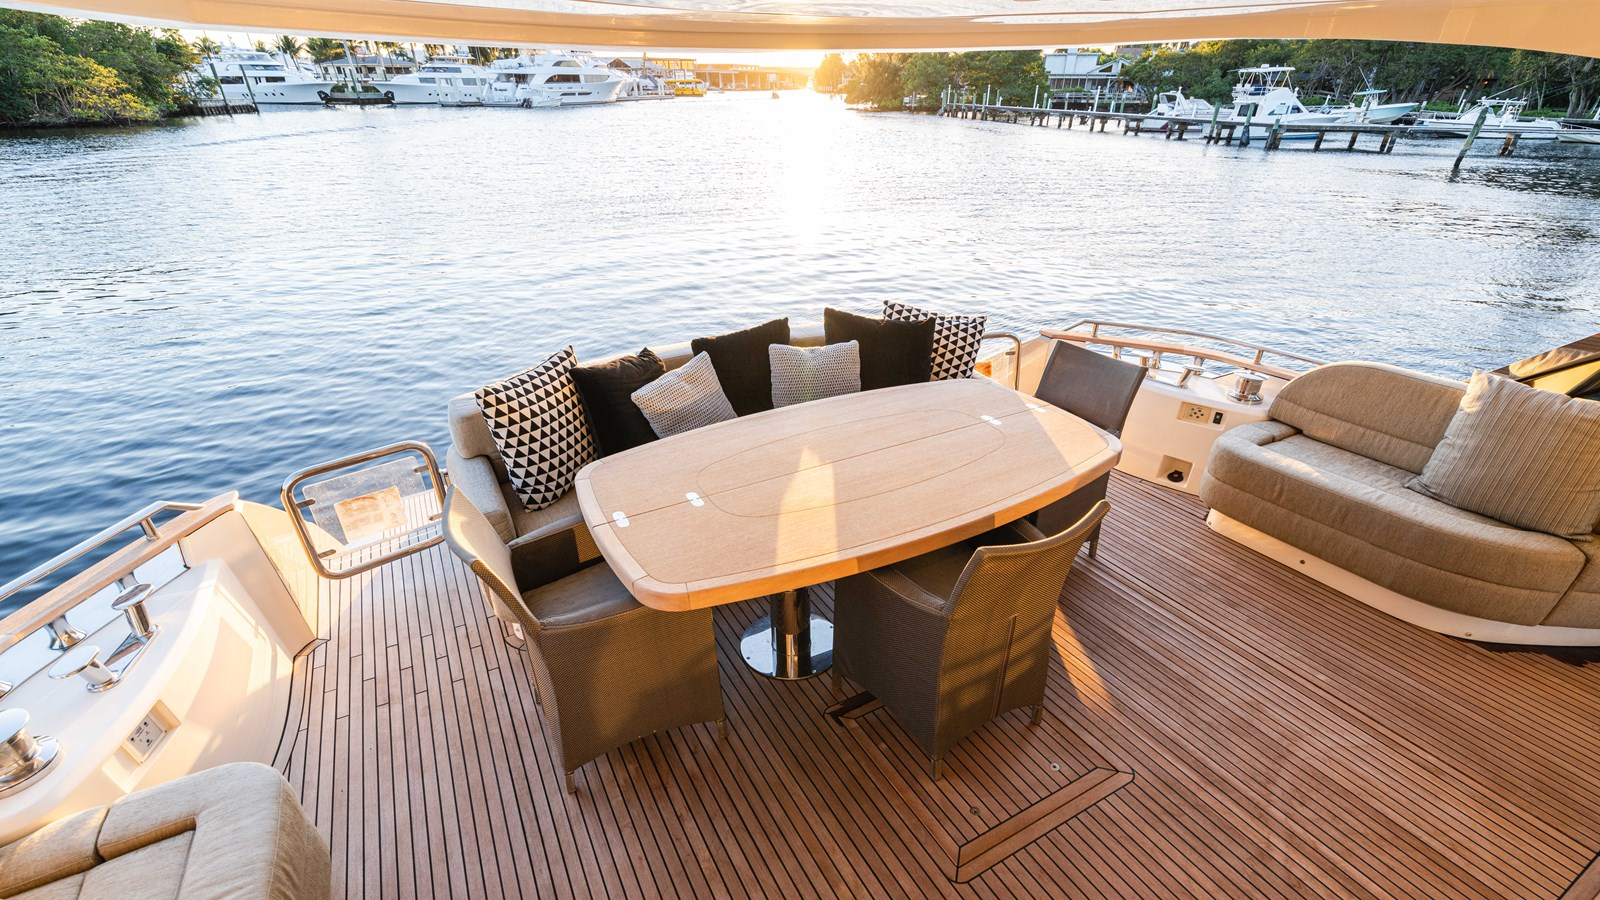 76 Monte Carlo (78 of 127) 2014 MONTE CARLO YACHTS Motoryacht Motor Yacht 2825064